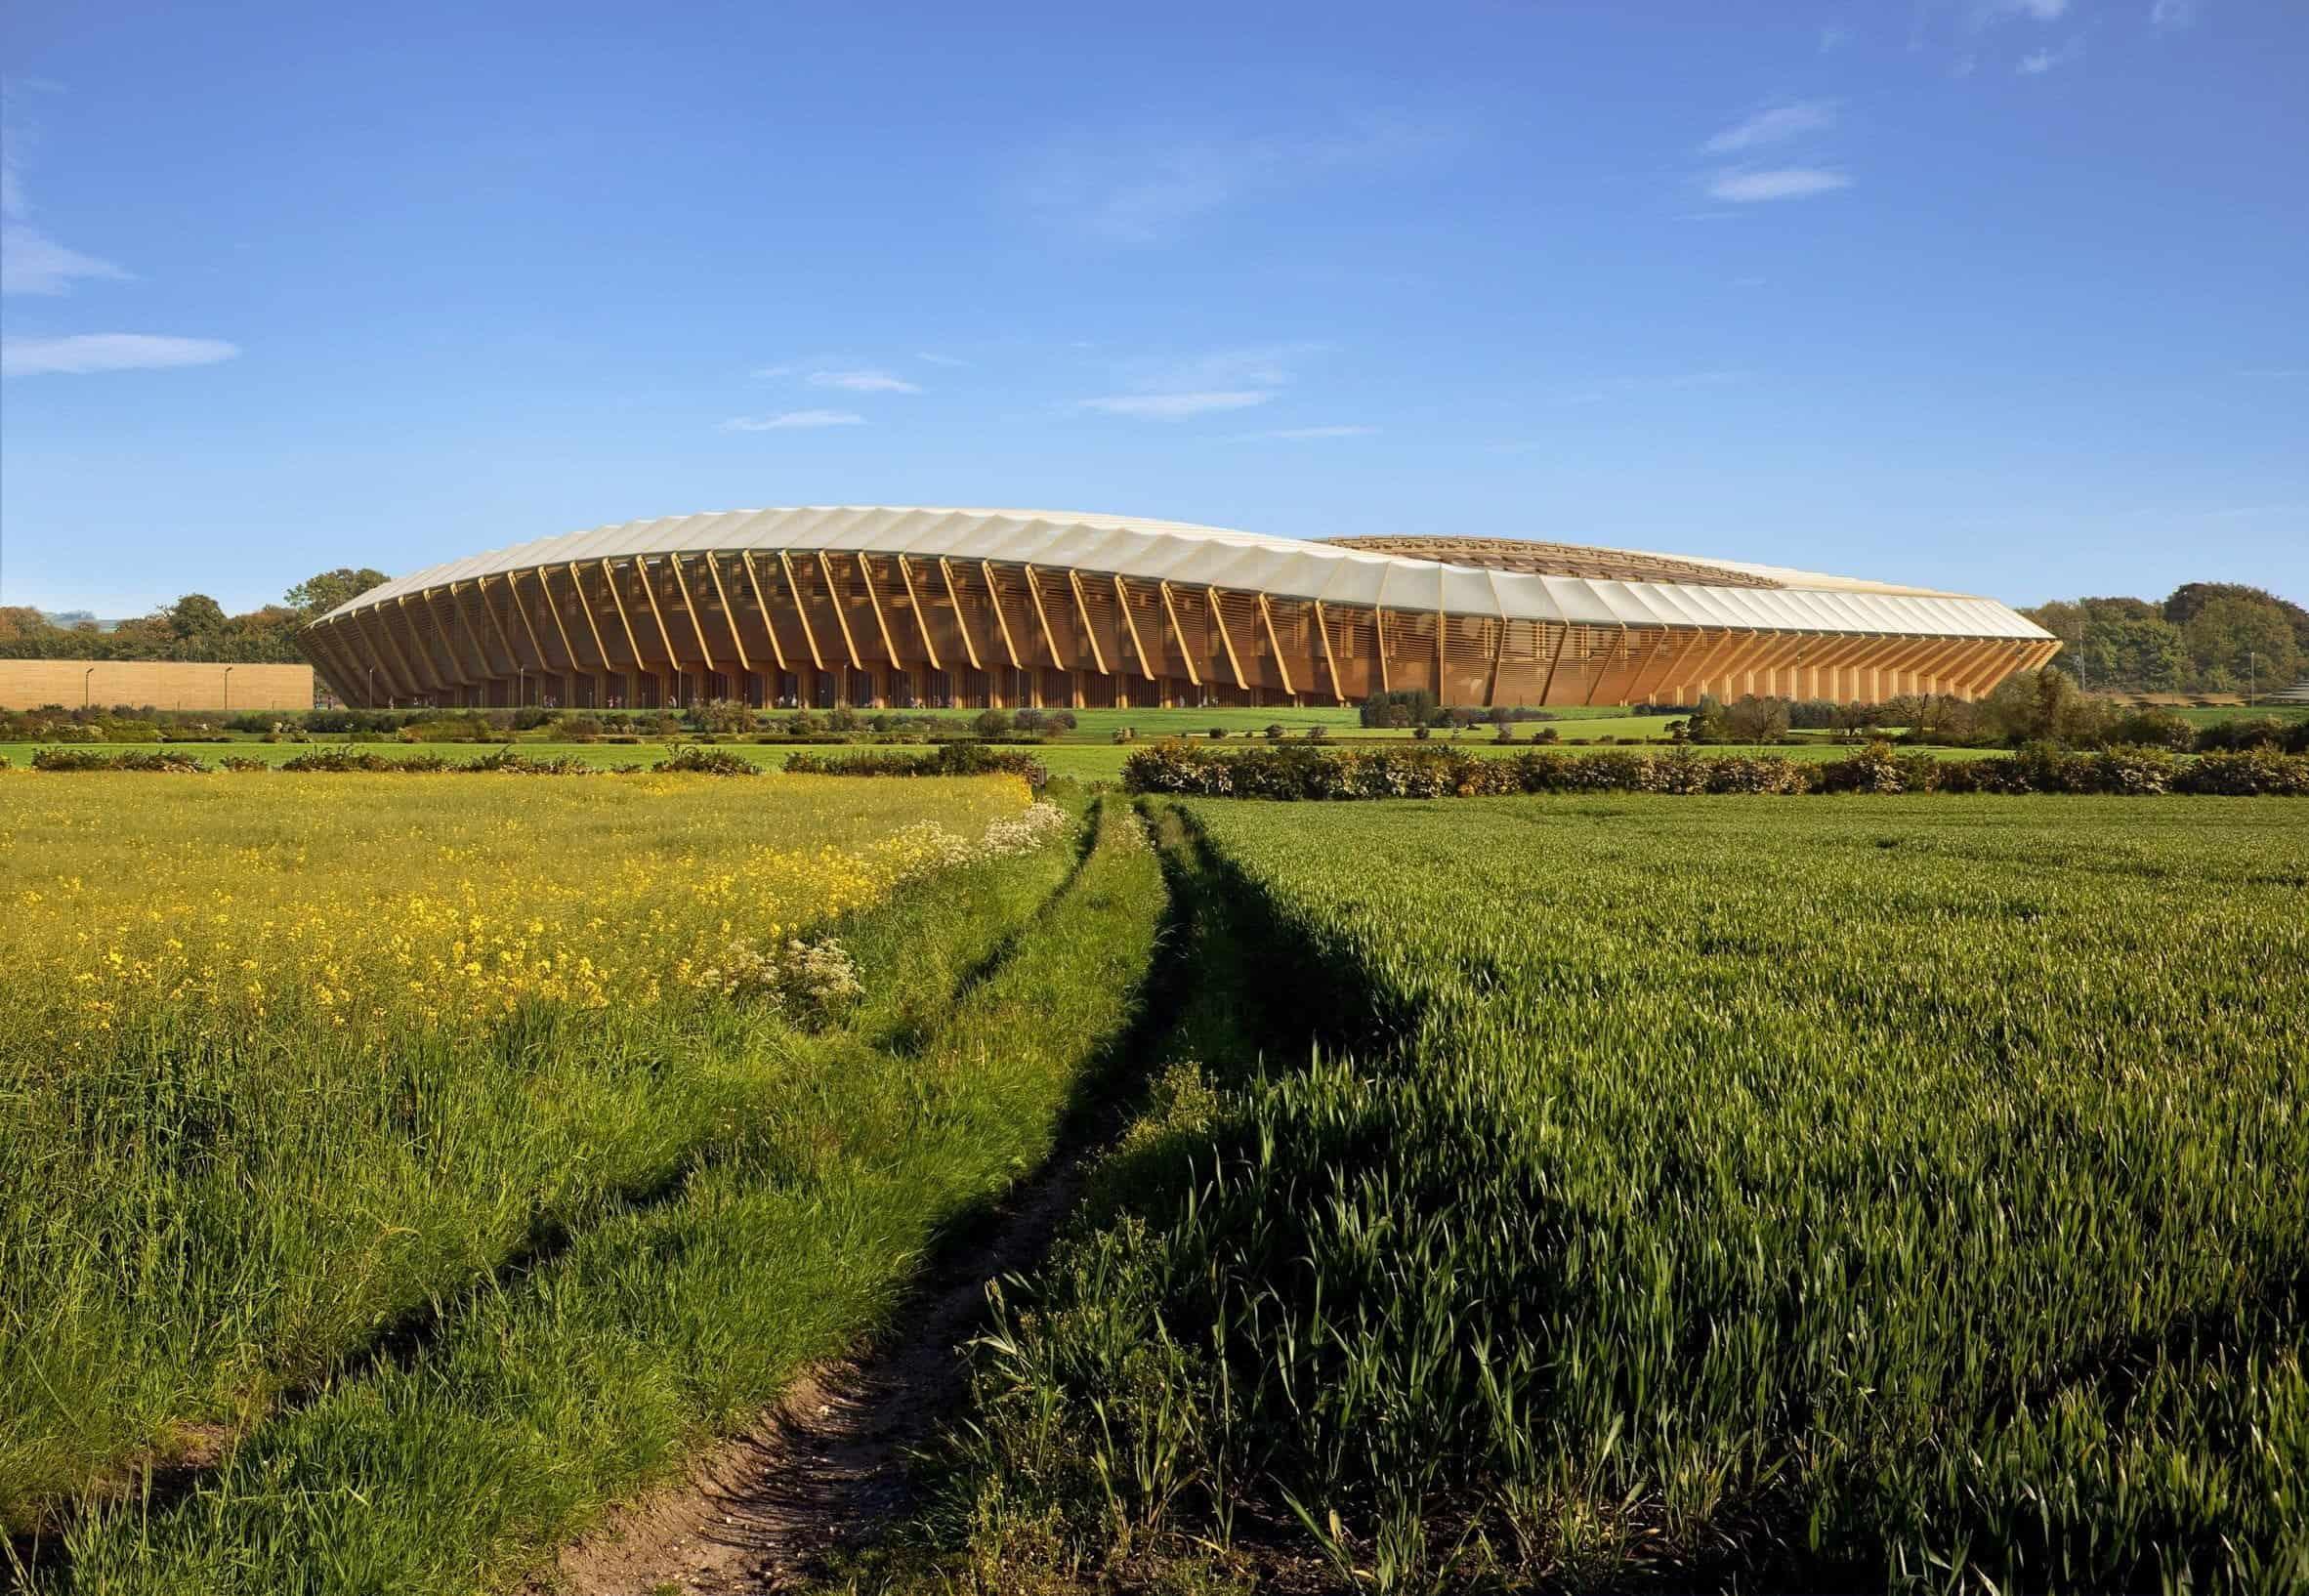 Houten voetbalstadion door Zaha Hadid Architects